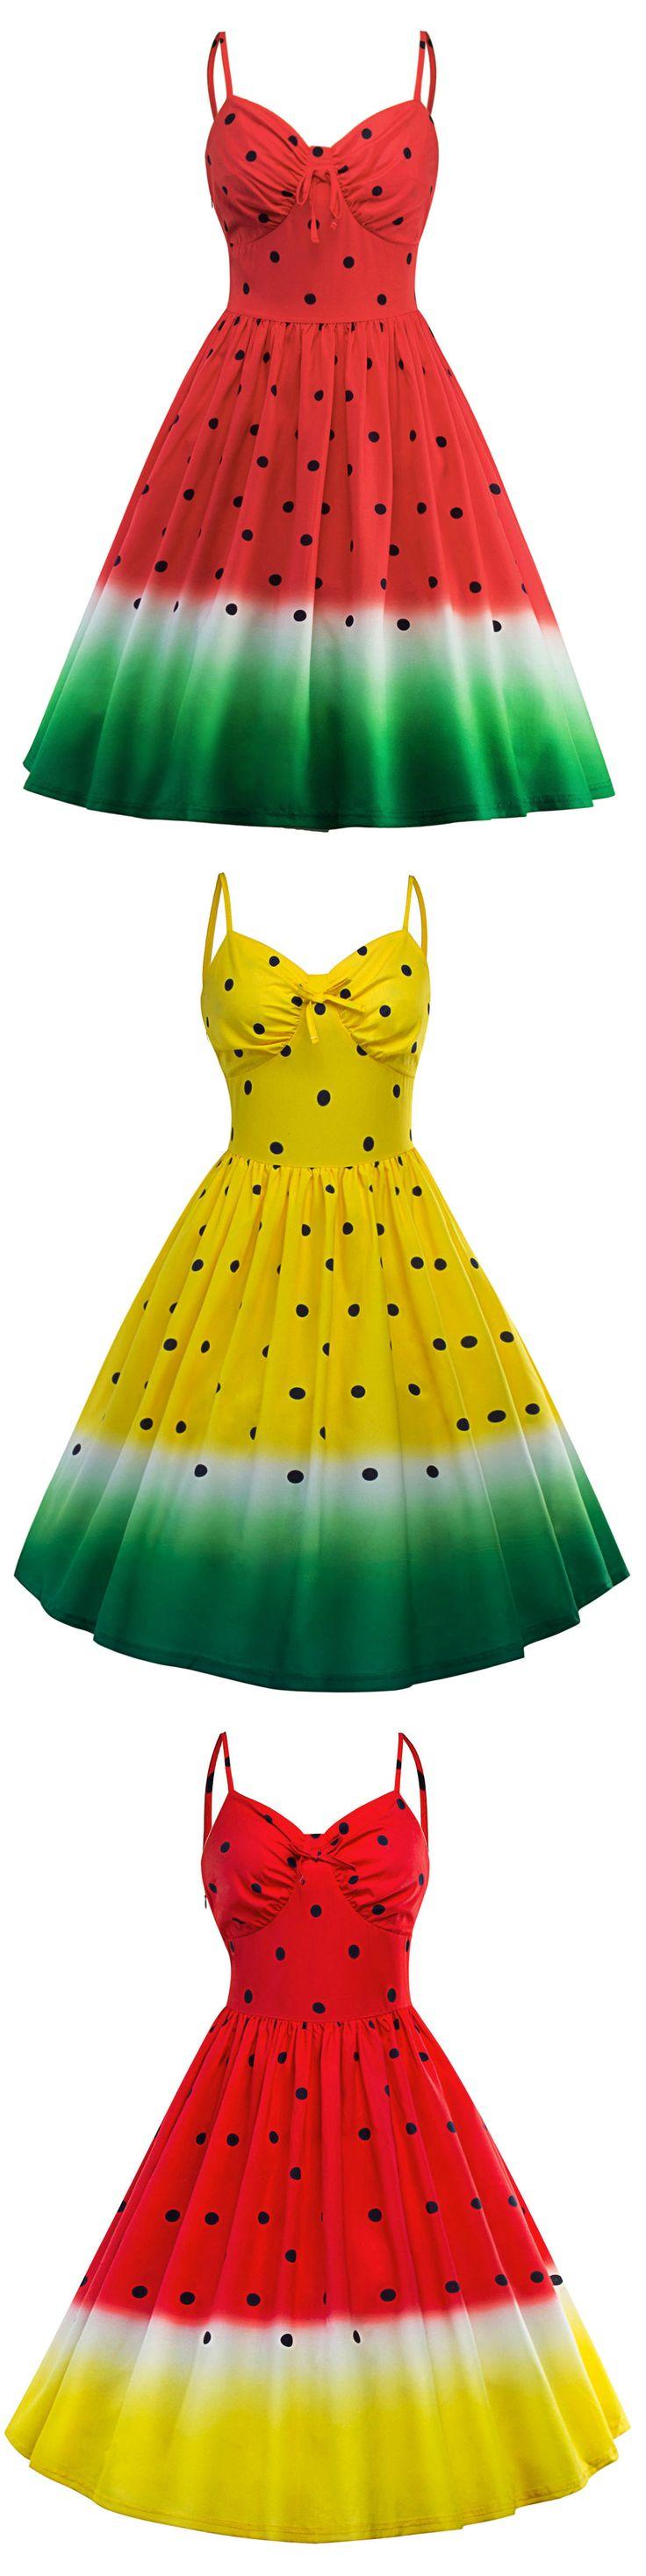 Spaghetti Strap A Line Watermelon Print Dress